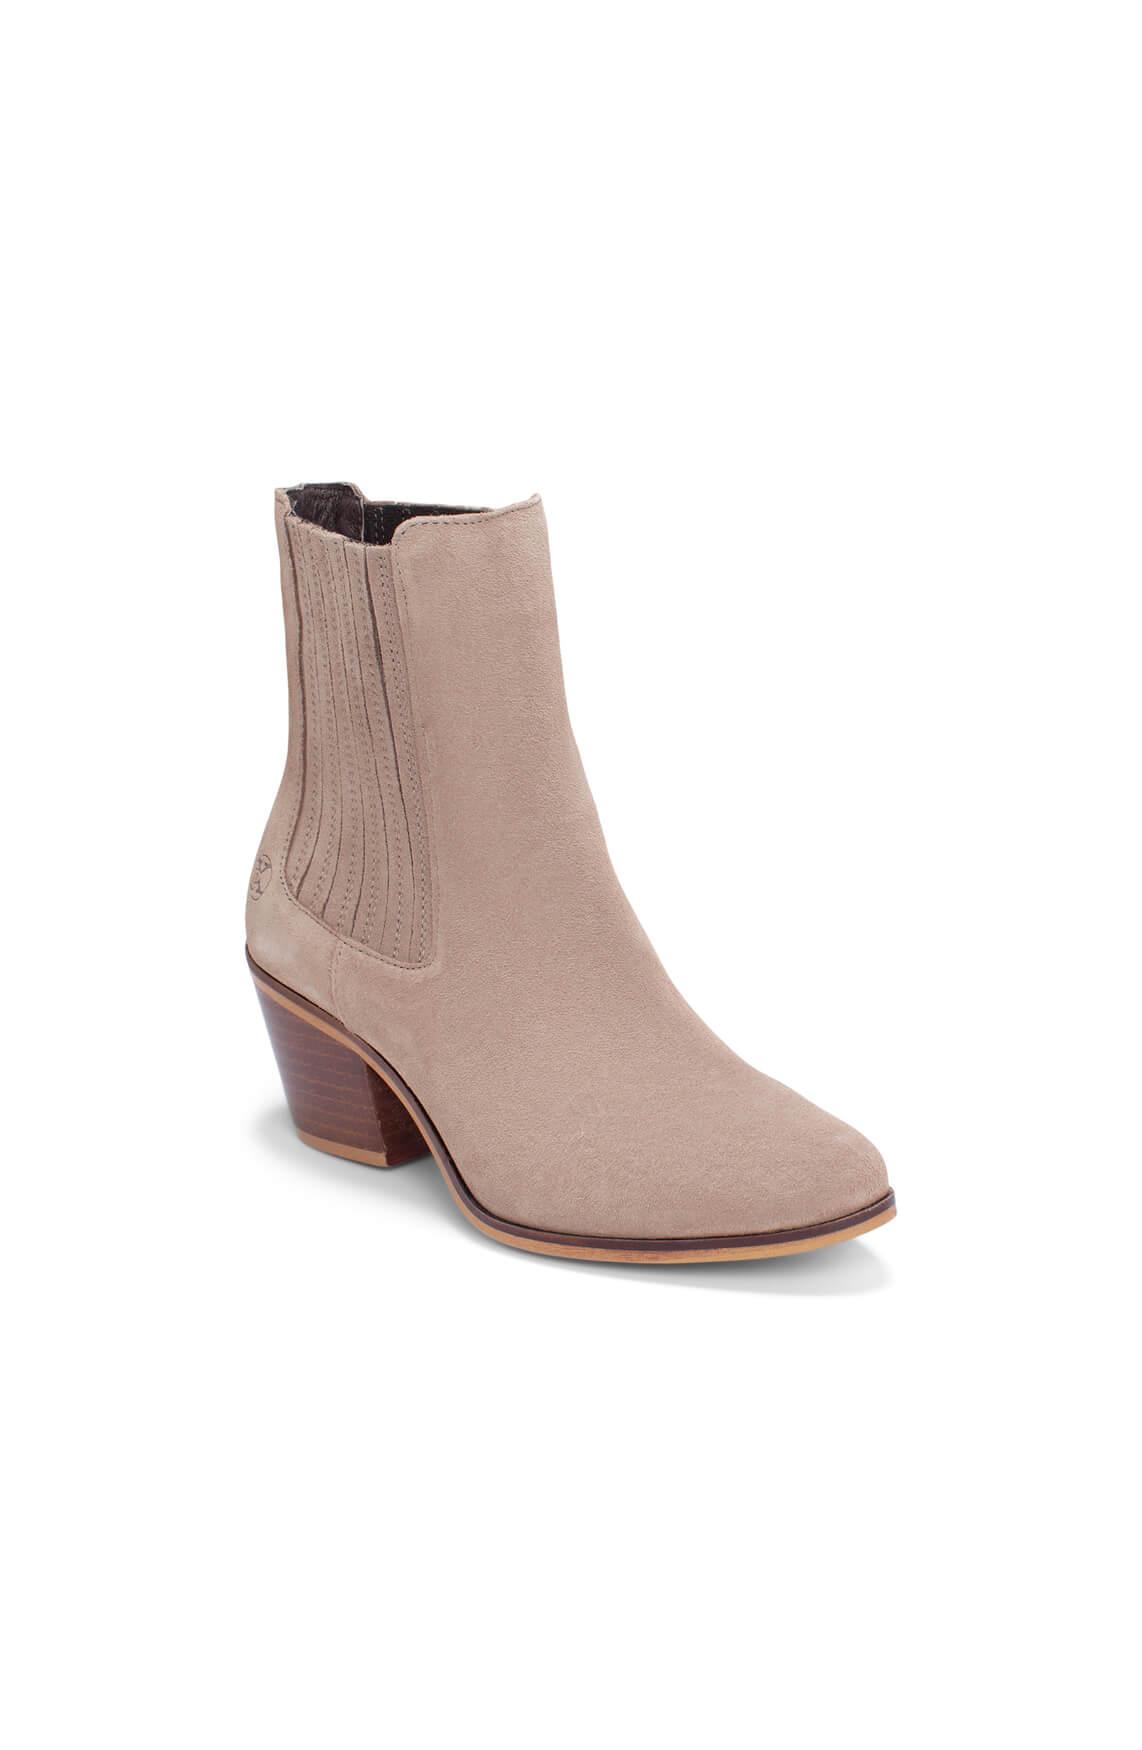 Only a Shoe Dames Suède laars Bruin